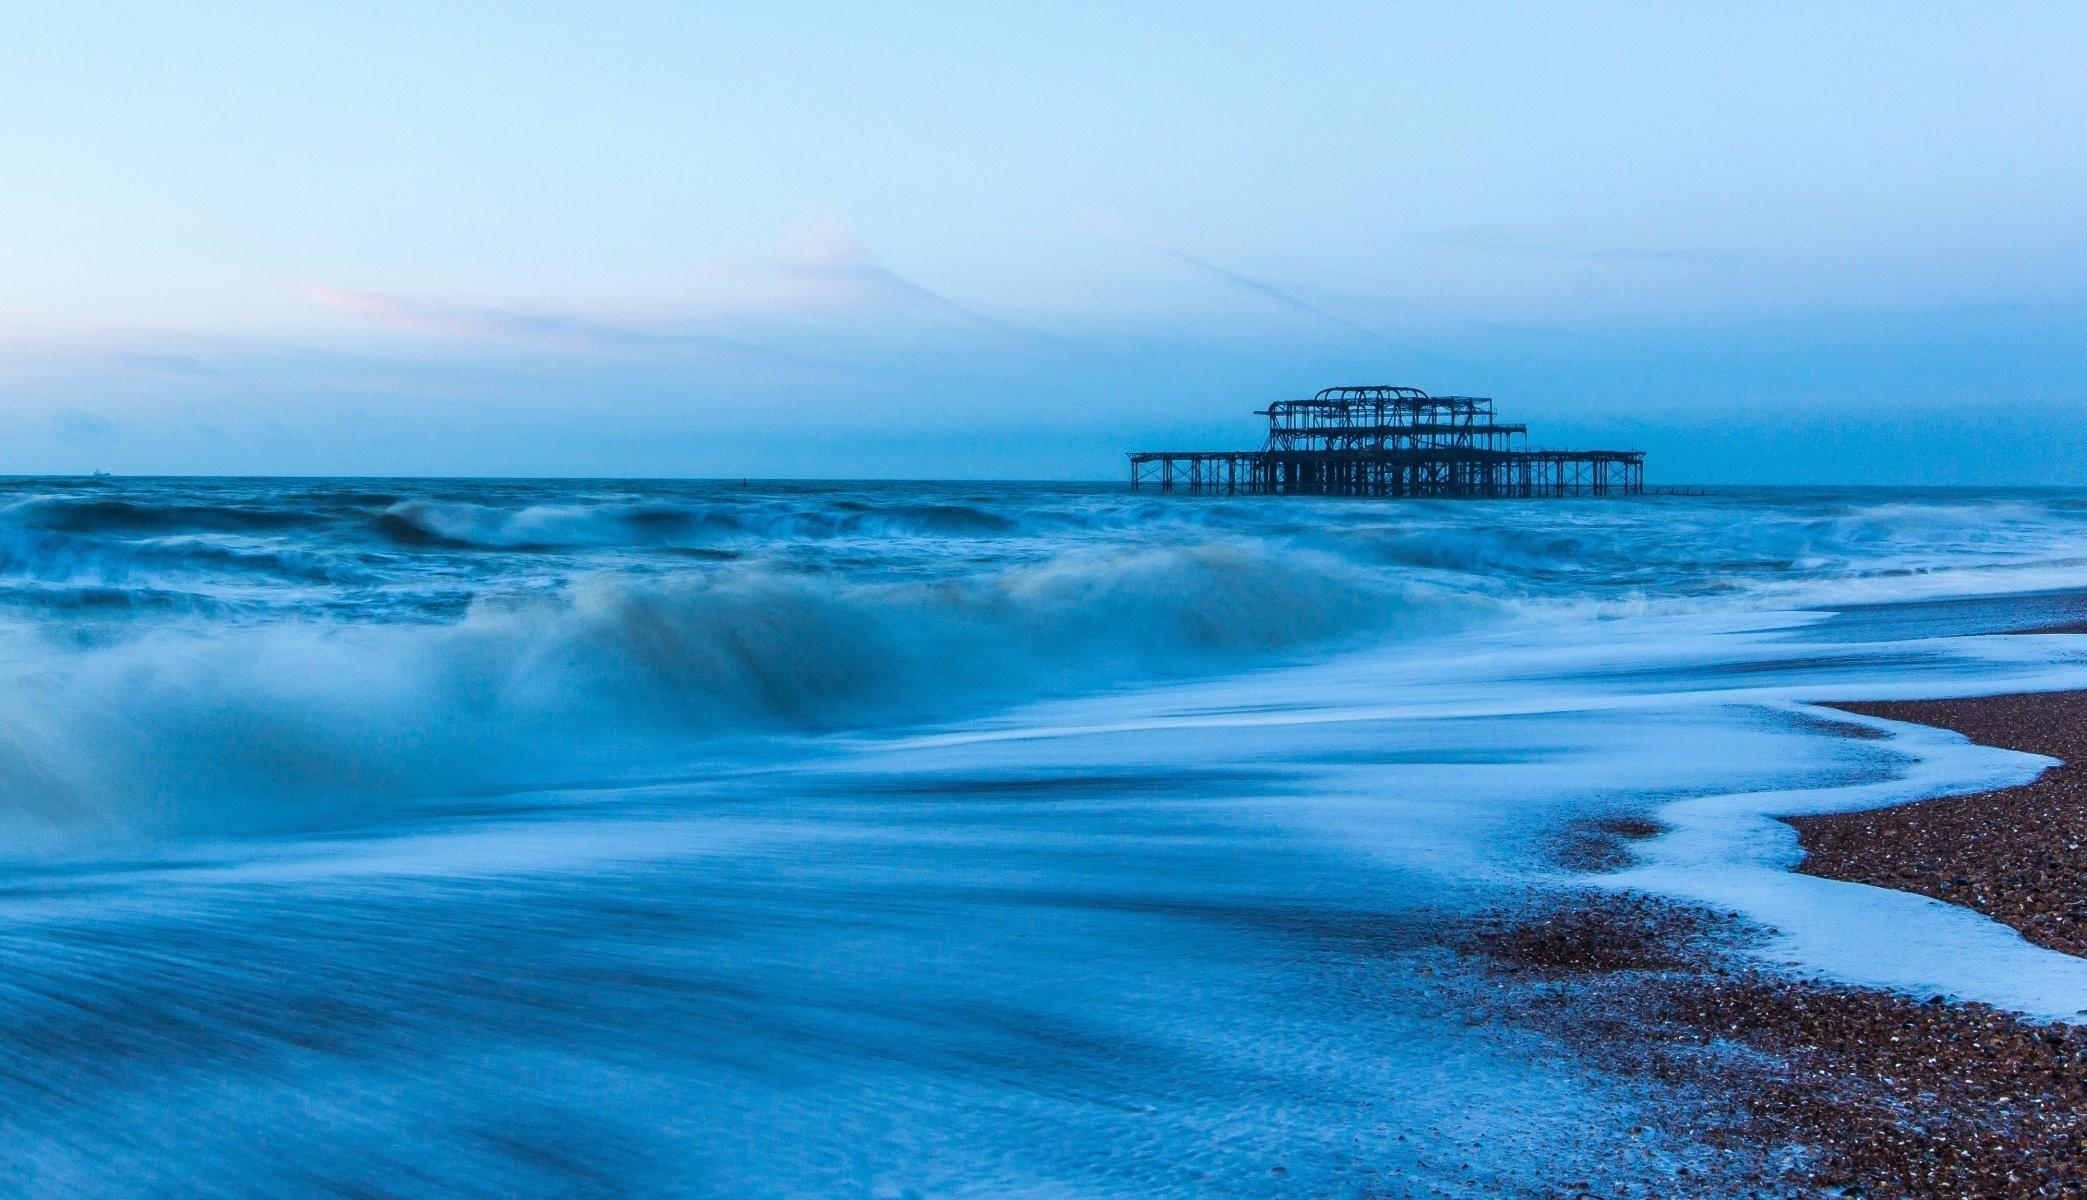 landscape nature sea water wave river sea ocean blue sky background  wallpaper widescreen full screen widescreen